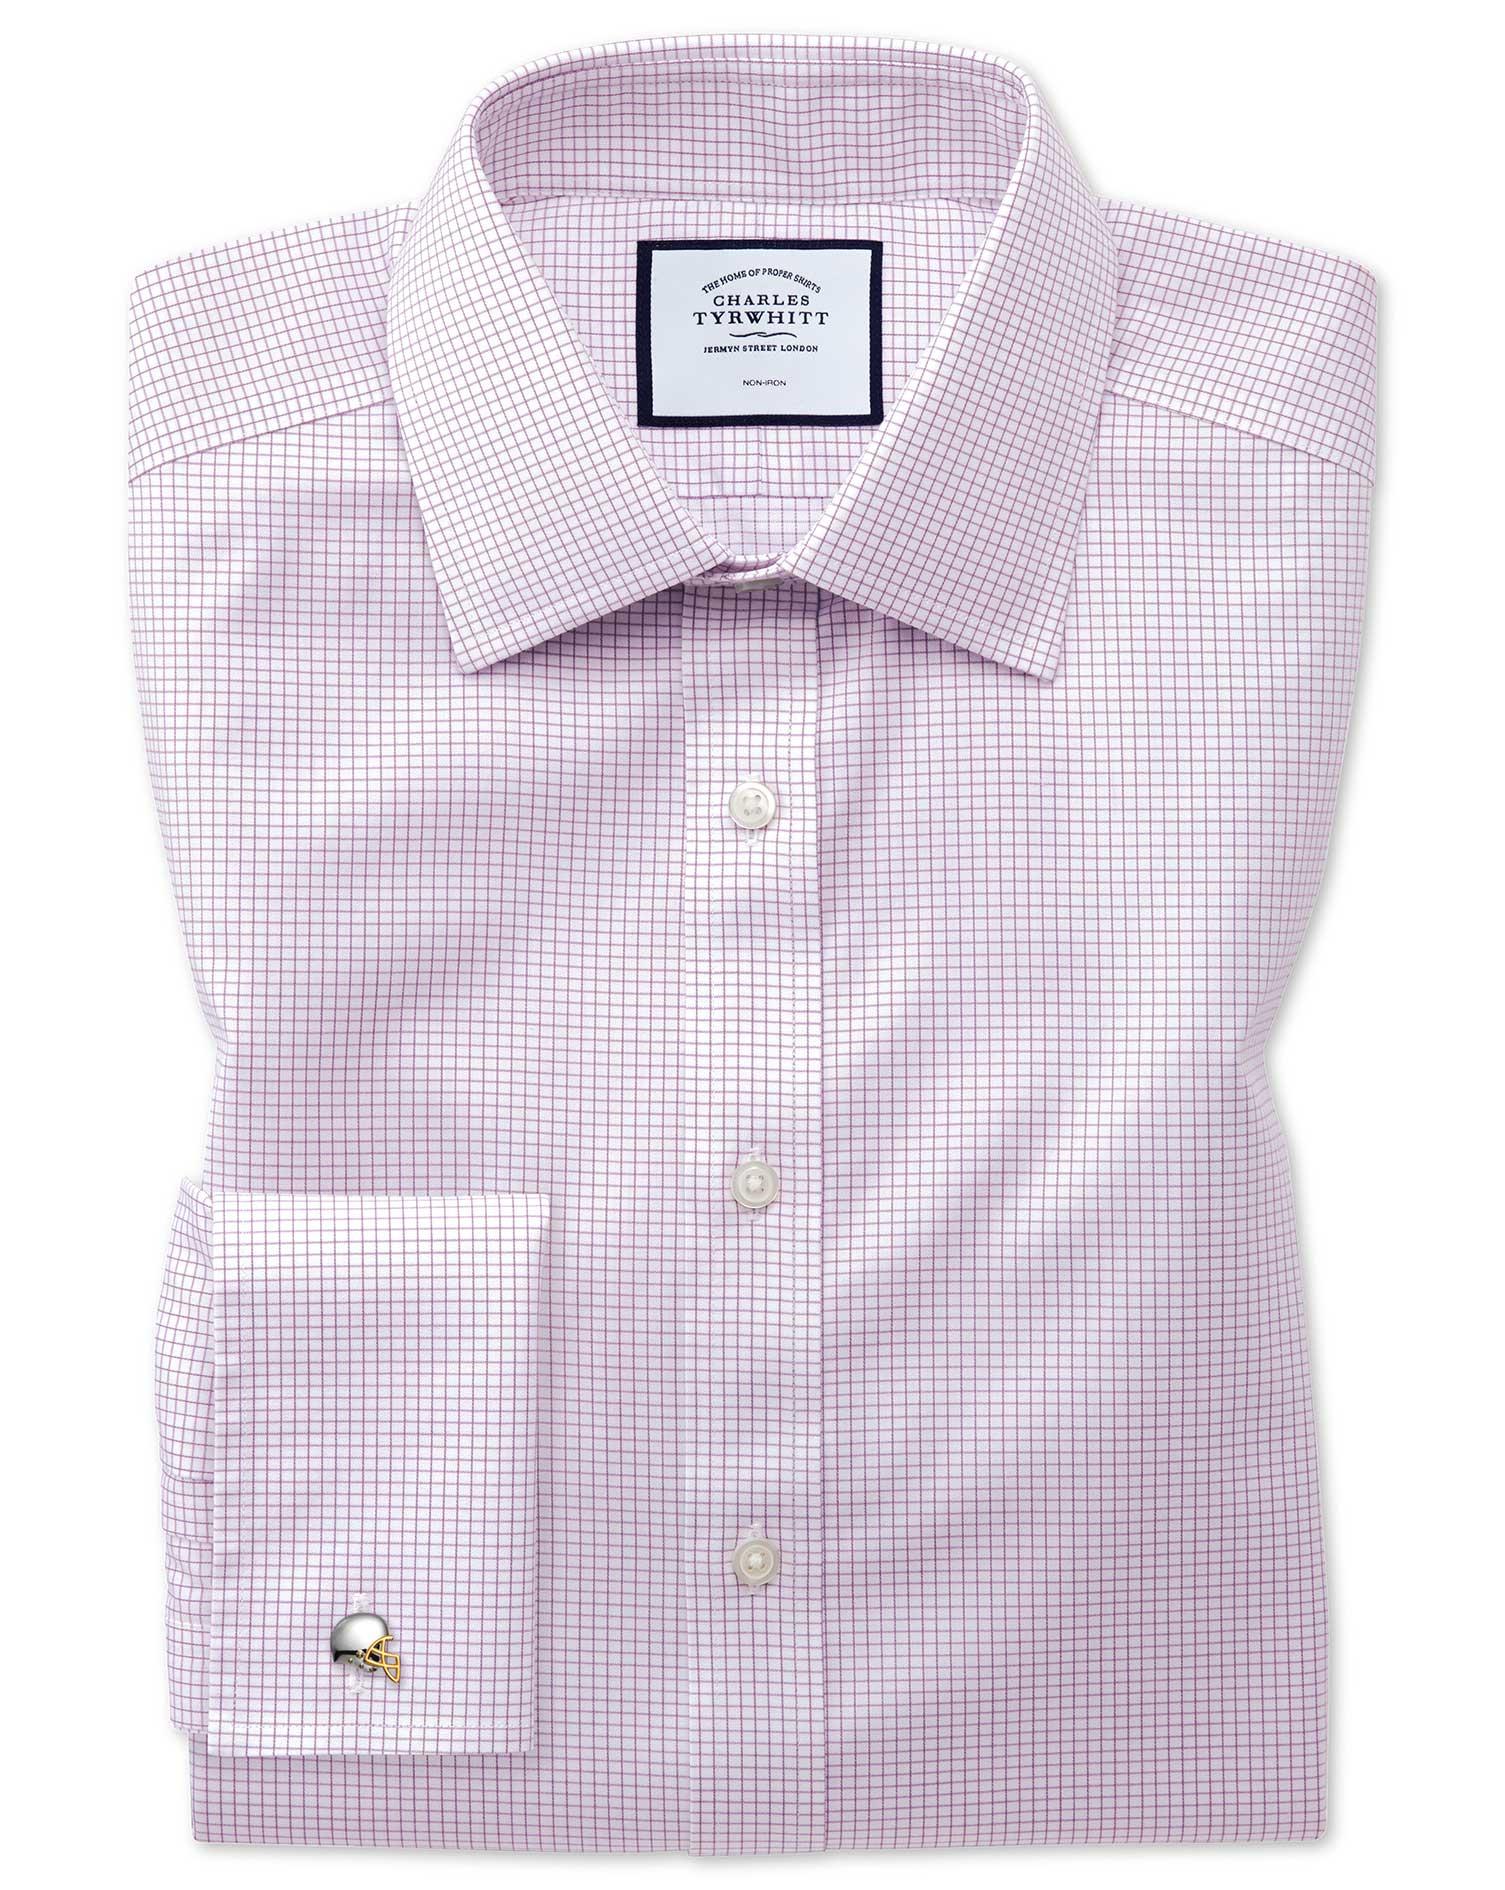 Classic Fit Non-Iron Twill Mini Grid Check Purple Cotton Formal Shirt Double Cuff Size 16/36 by Char